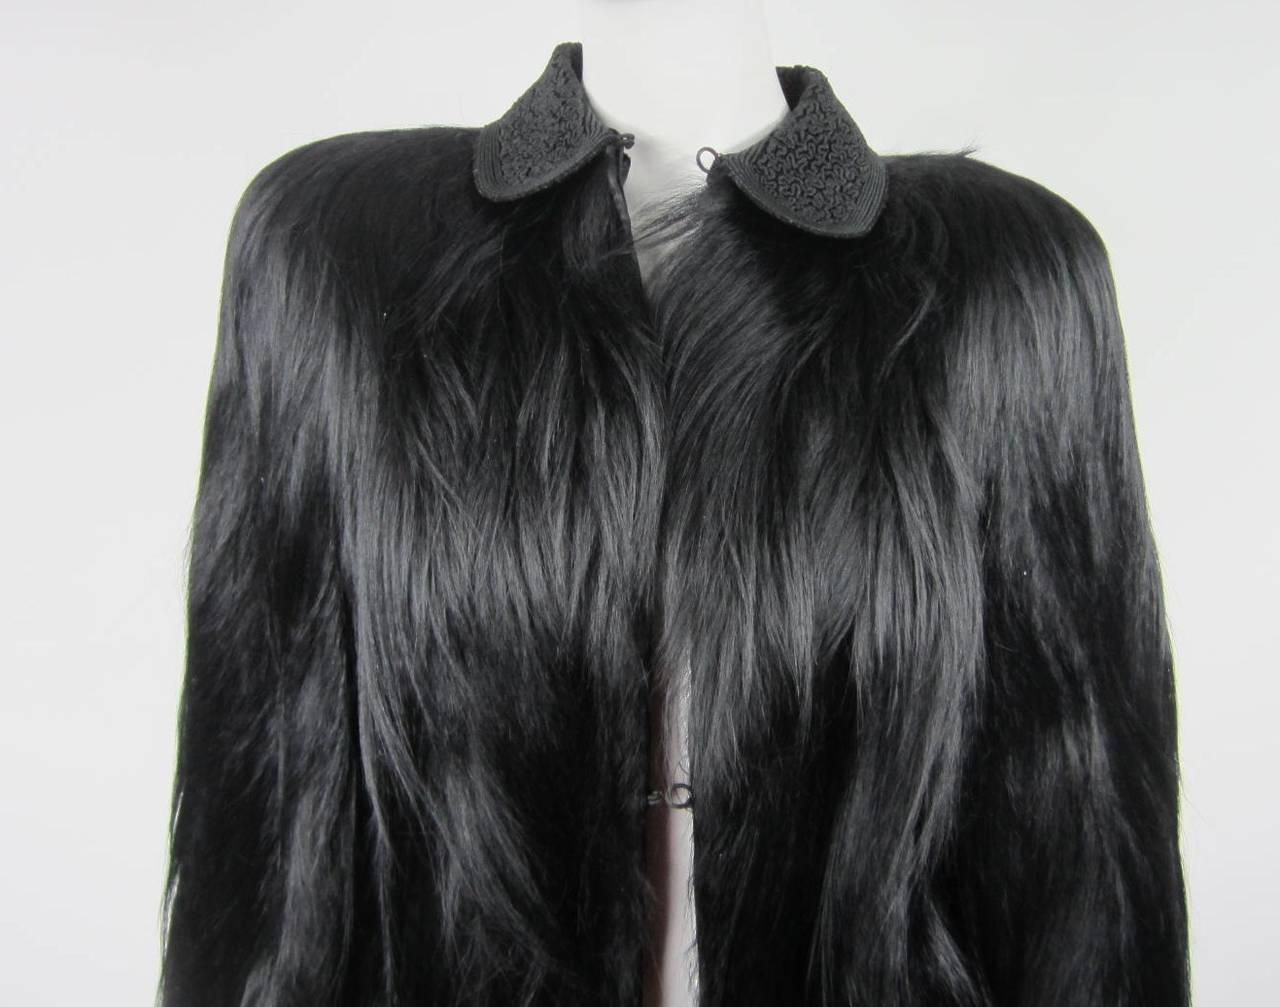 Stunning 1940s Vintage Black Monkey Coat At 1stdibs